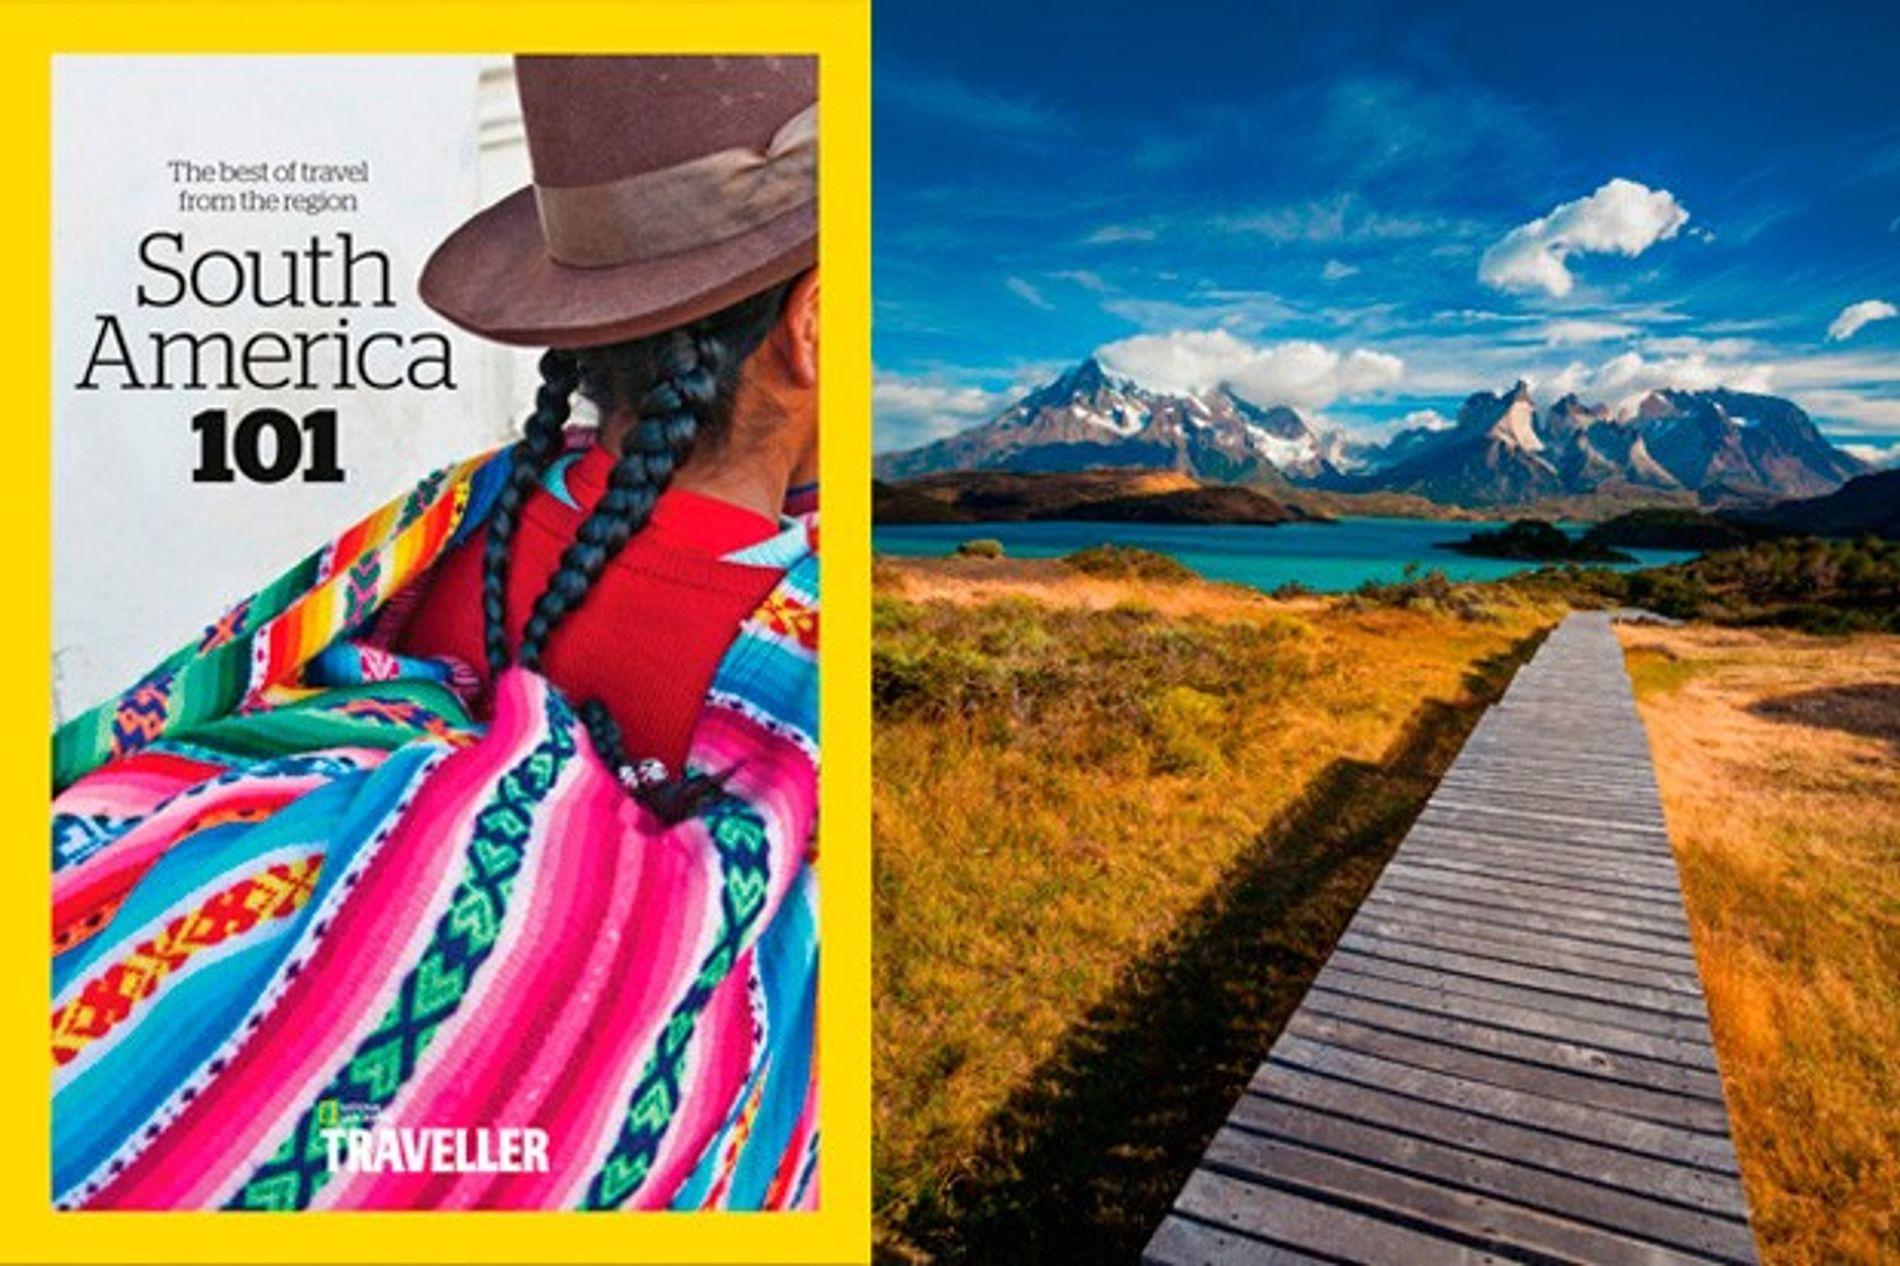 South America 101 Guide